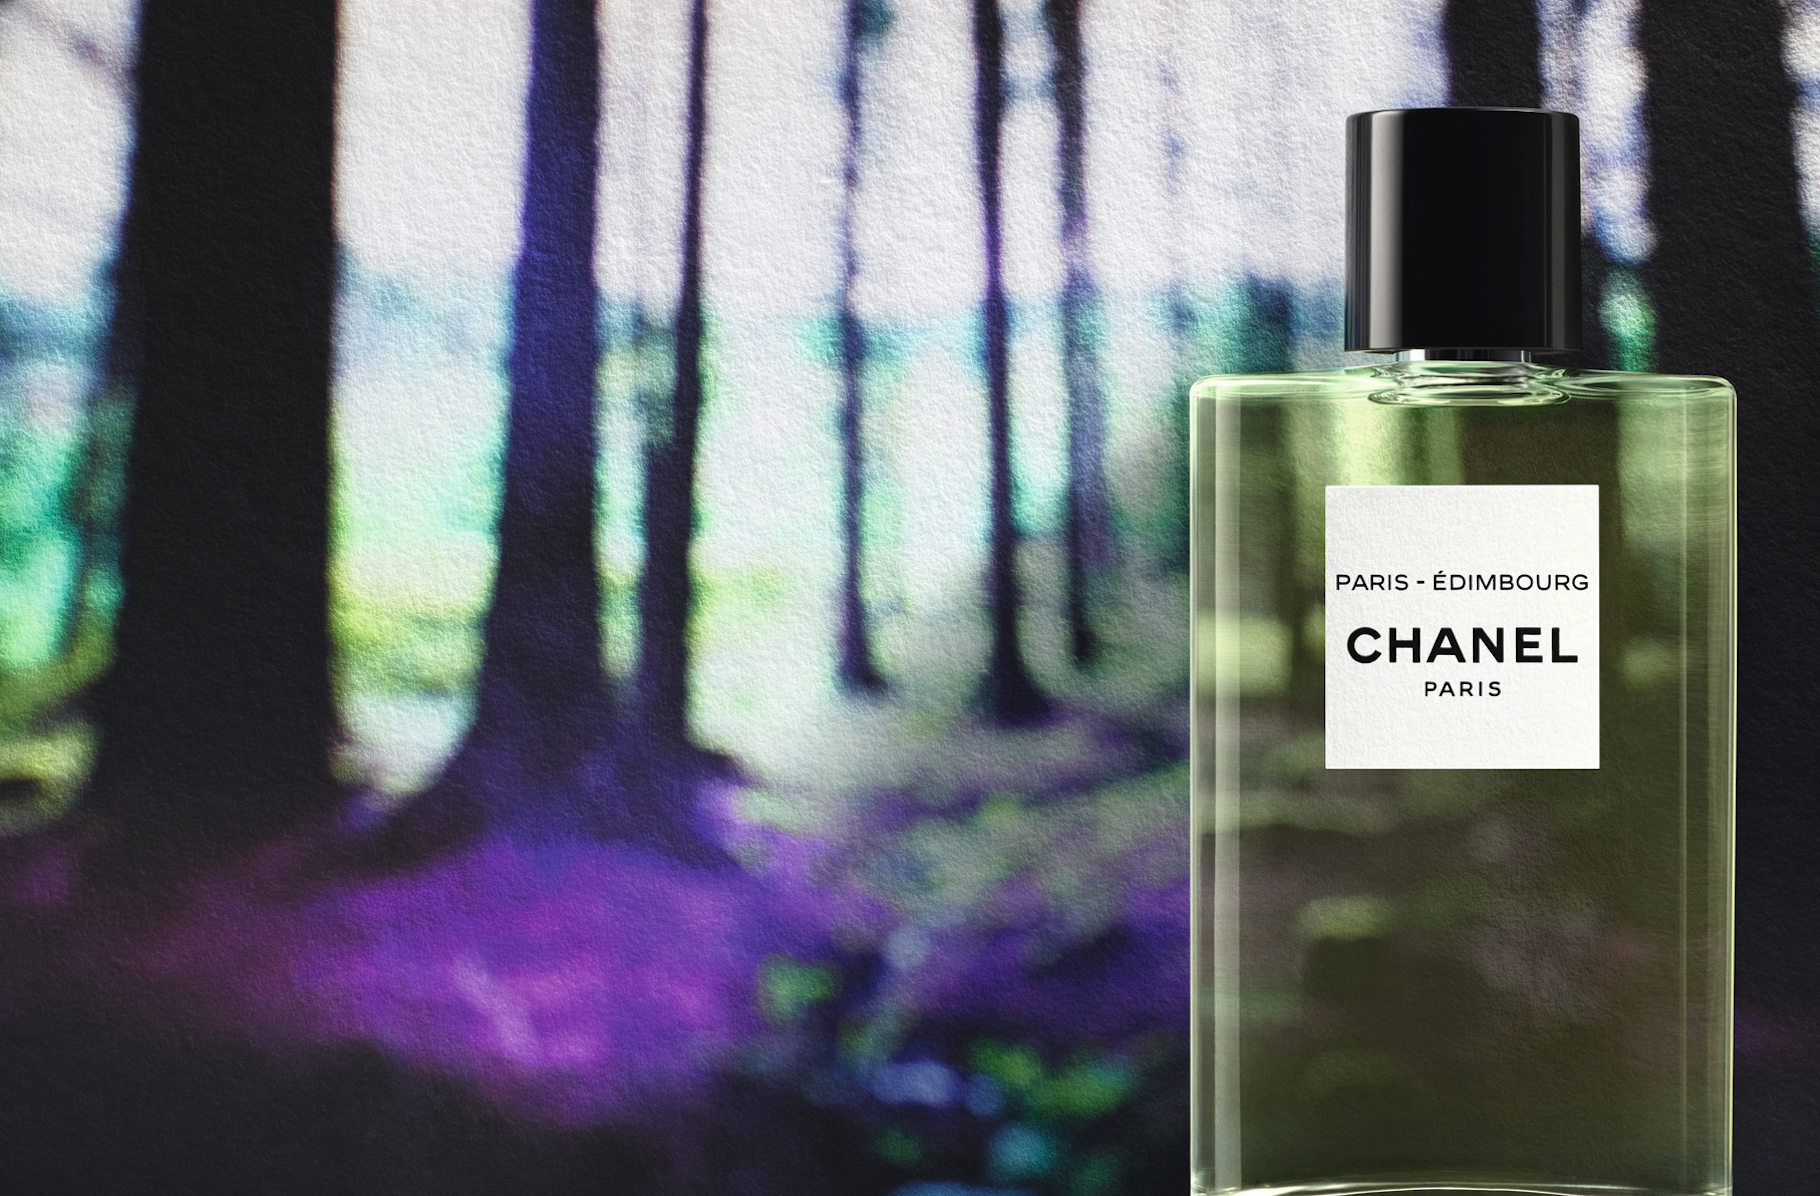 Chanel paris Edimbourg slider le magazine